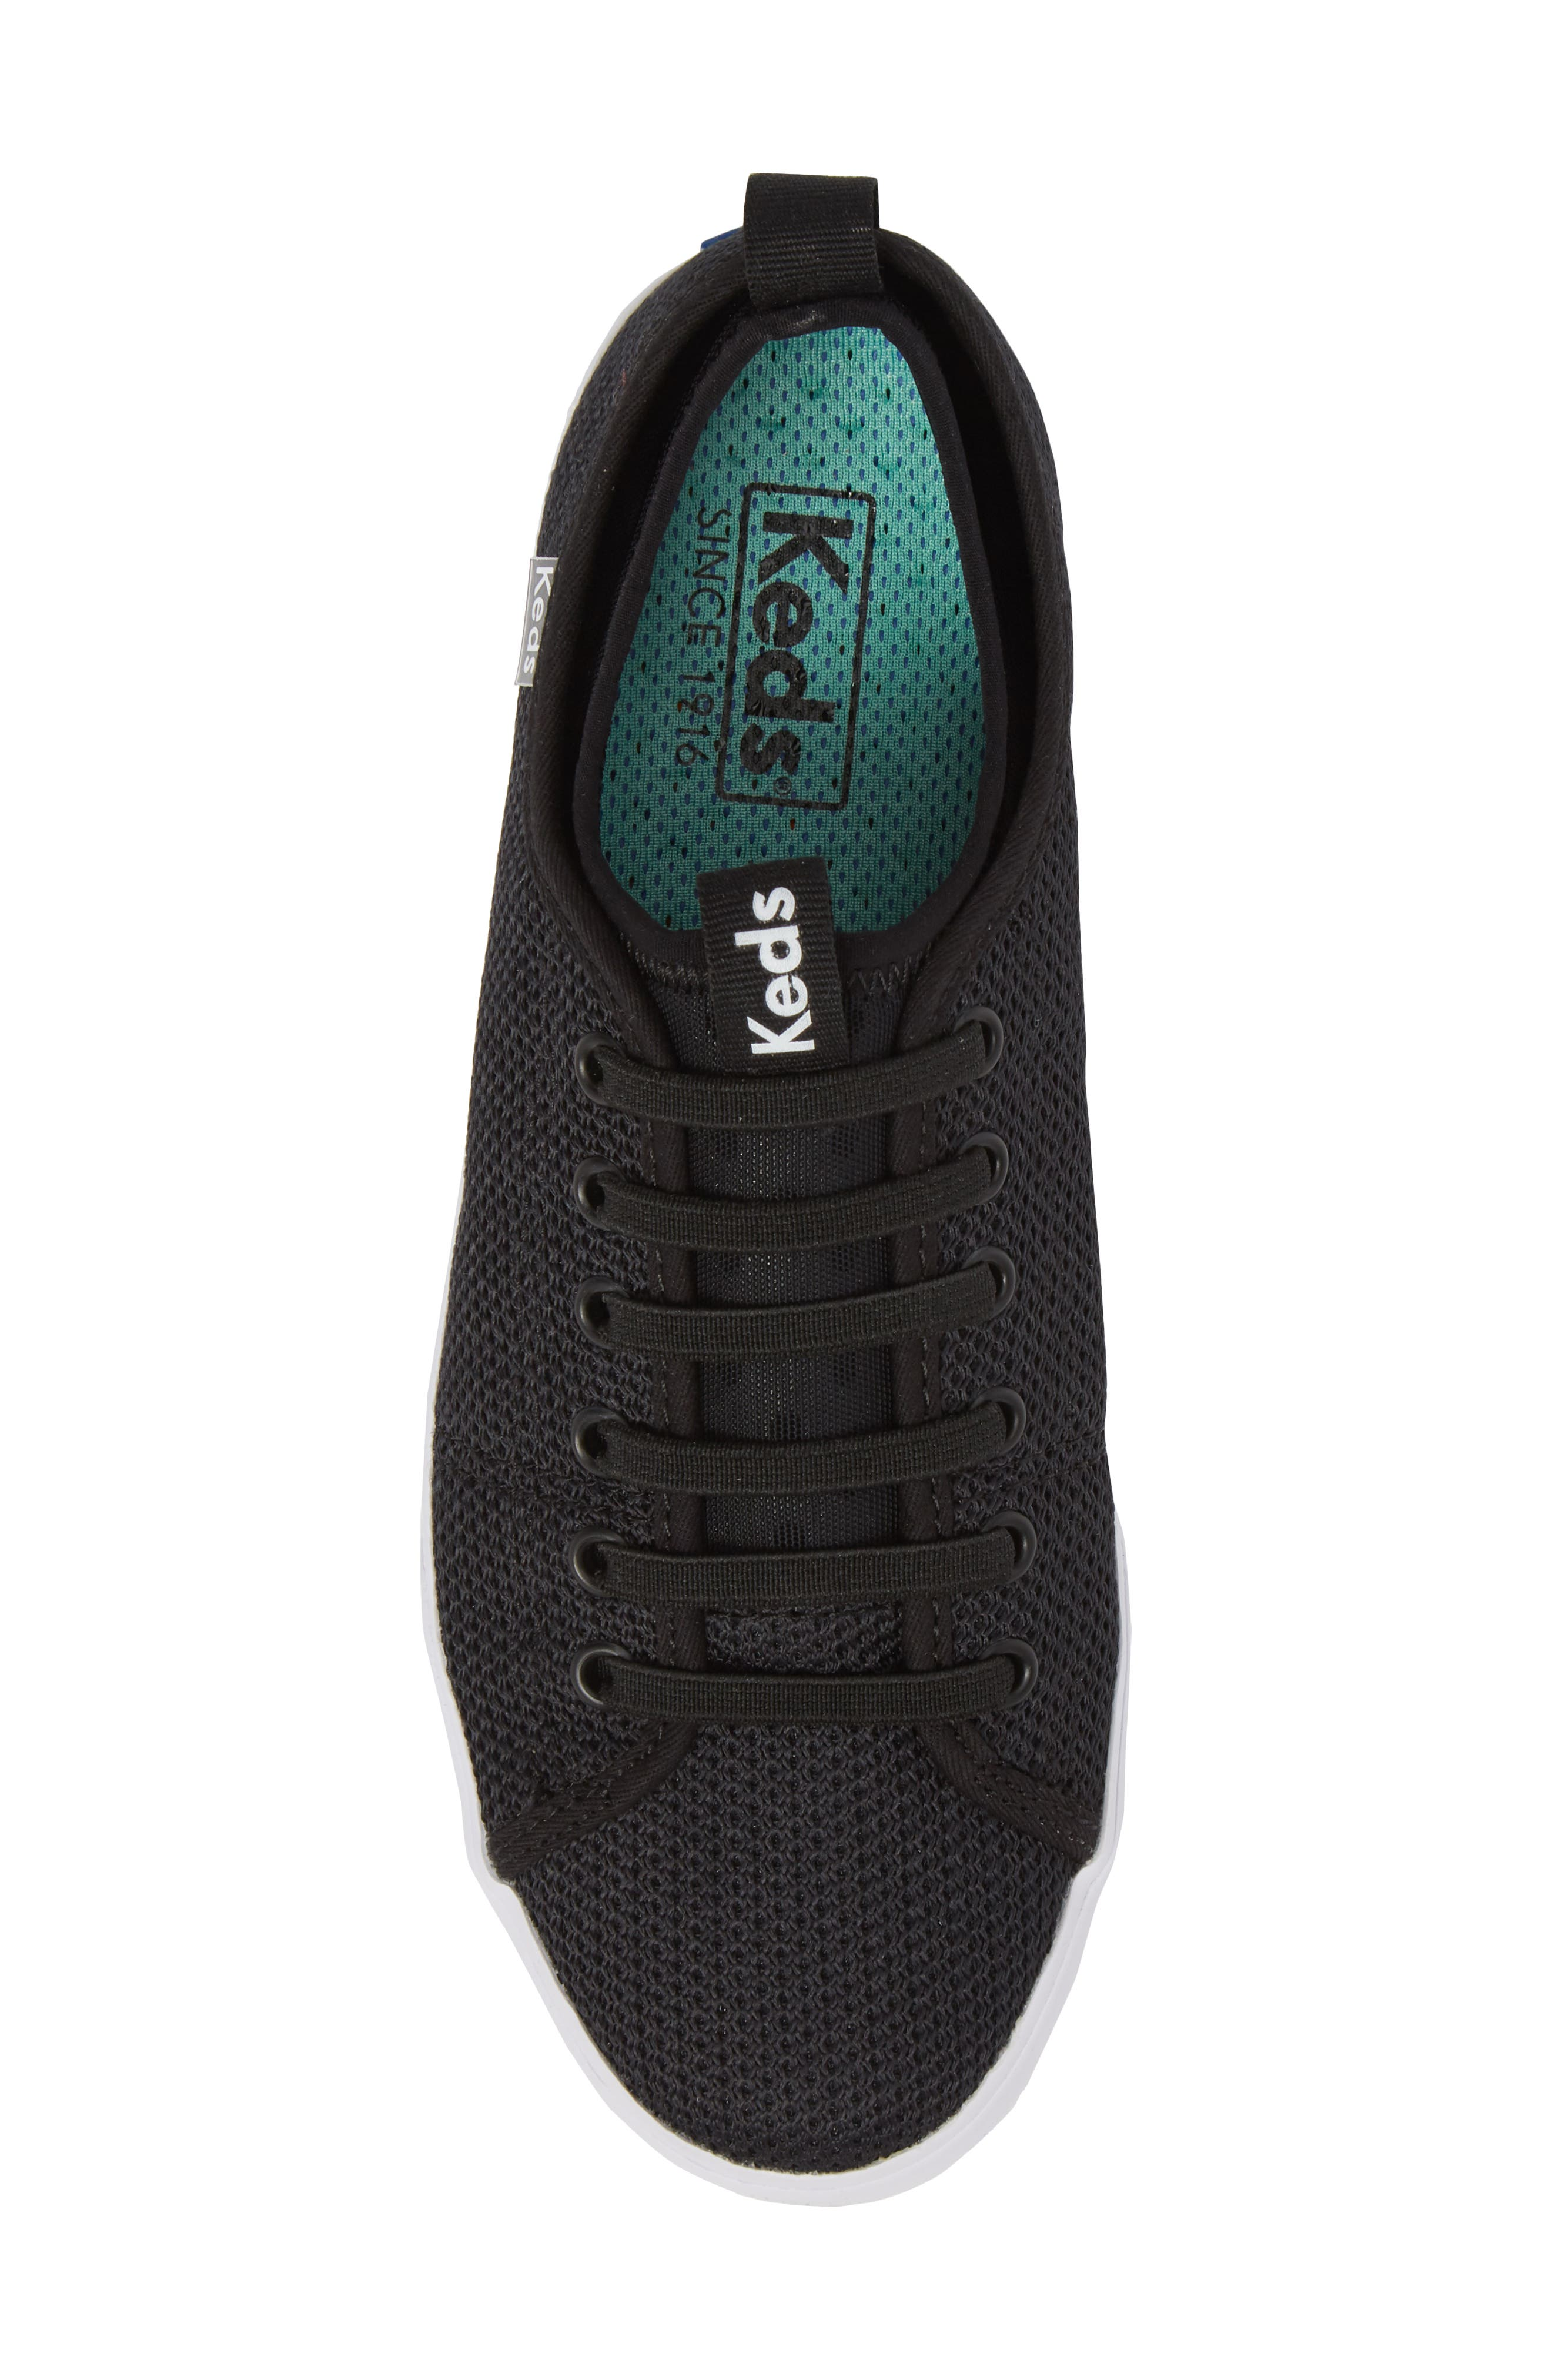 Driftkick Heathered Mesh Sneaker,                             Alternate thumbnail 5, color,                             Black